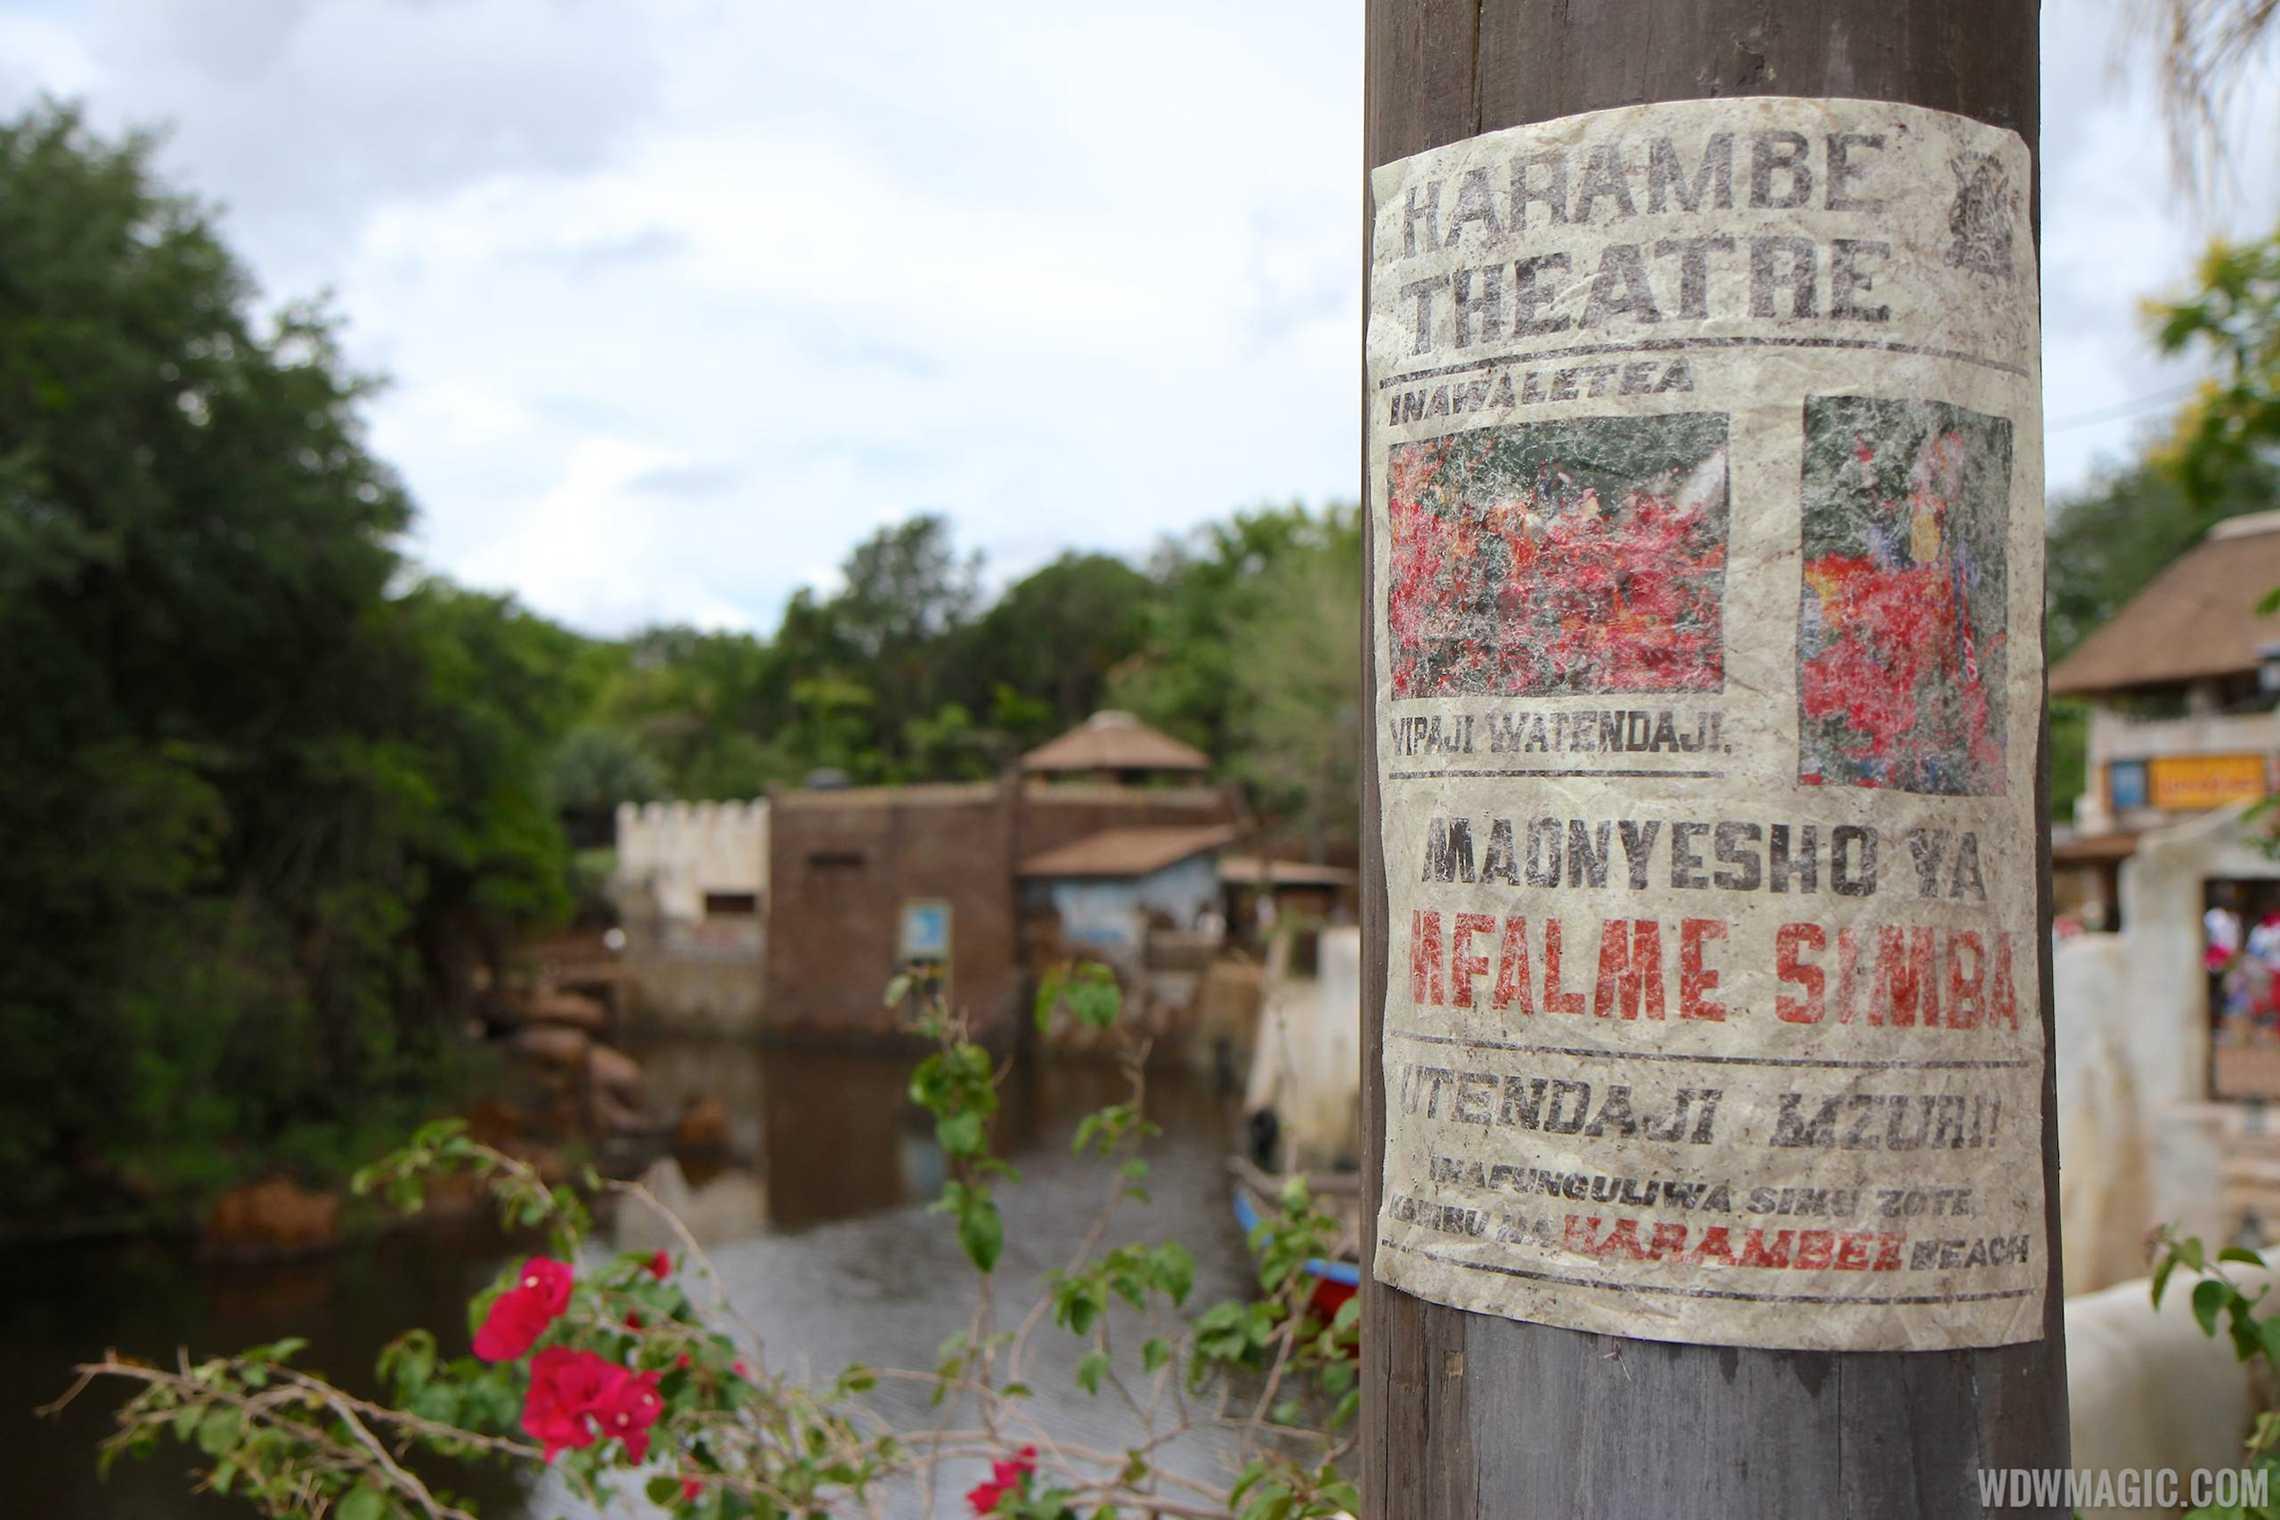 New Harambe Theatre area - Poster art